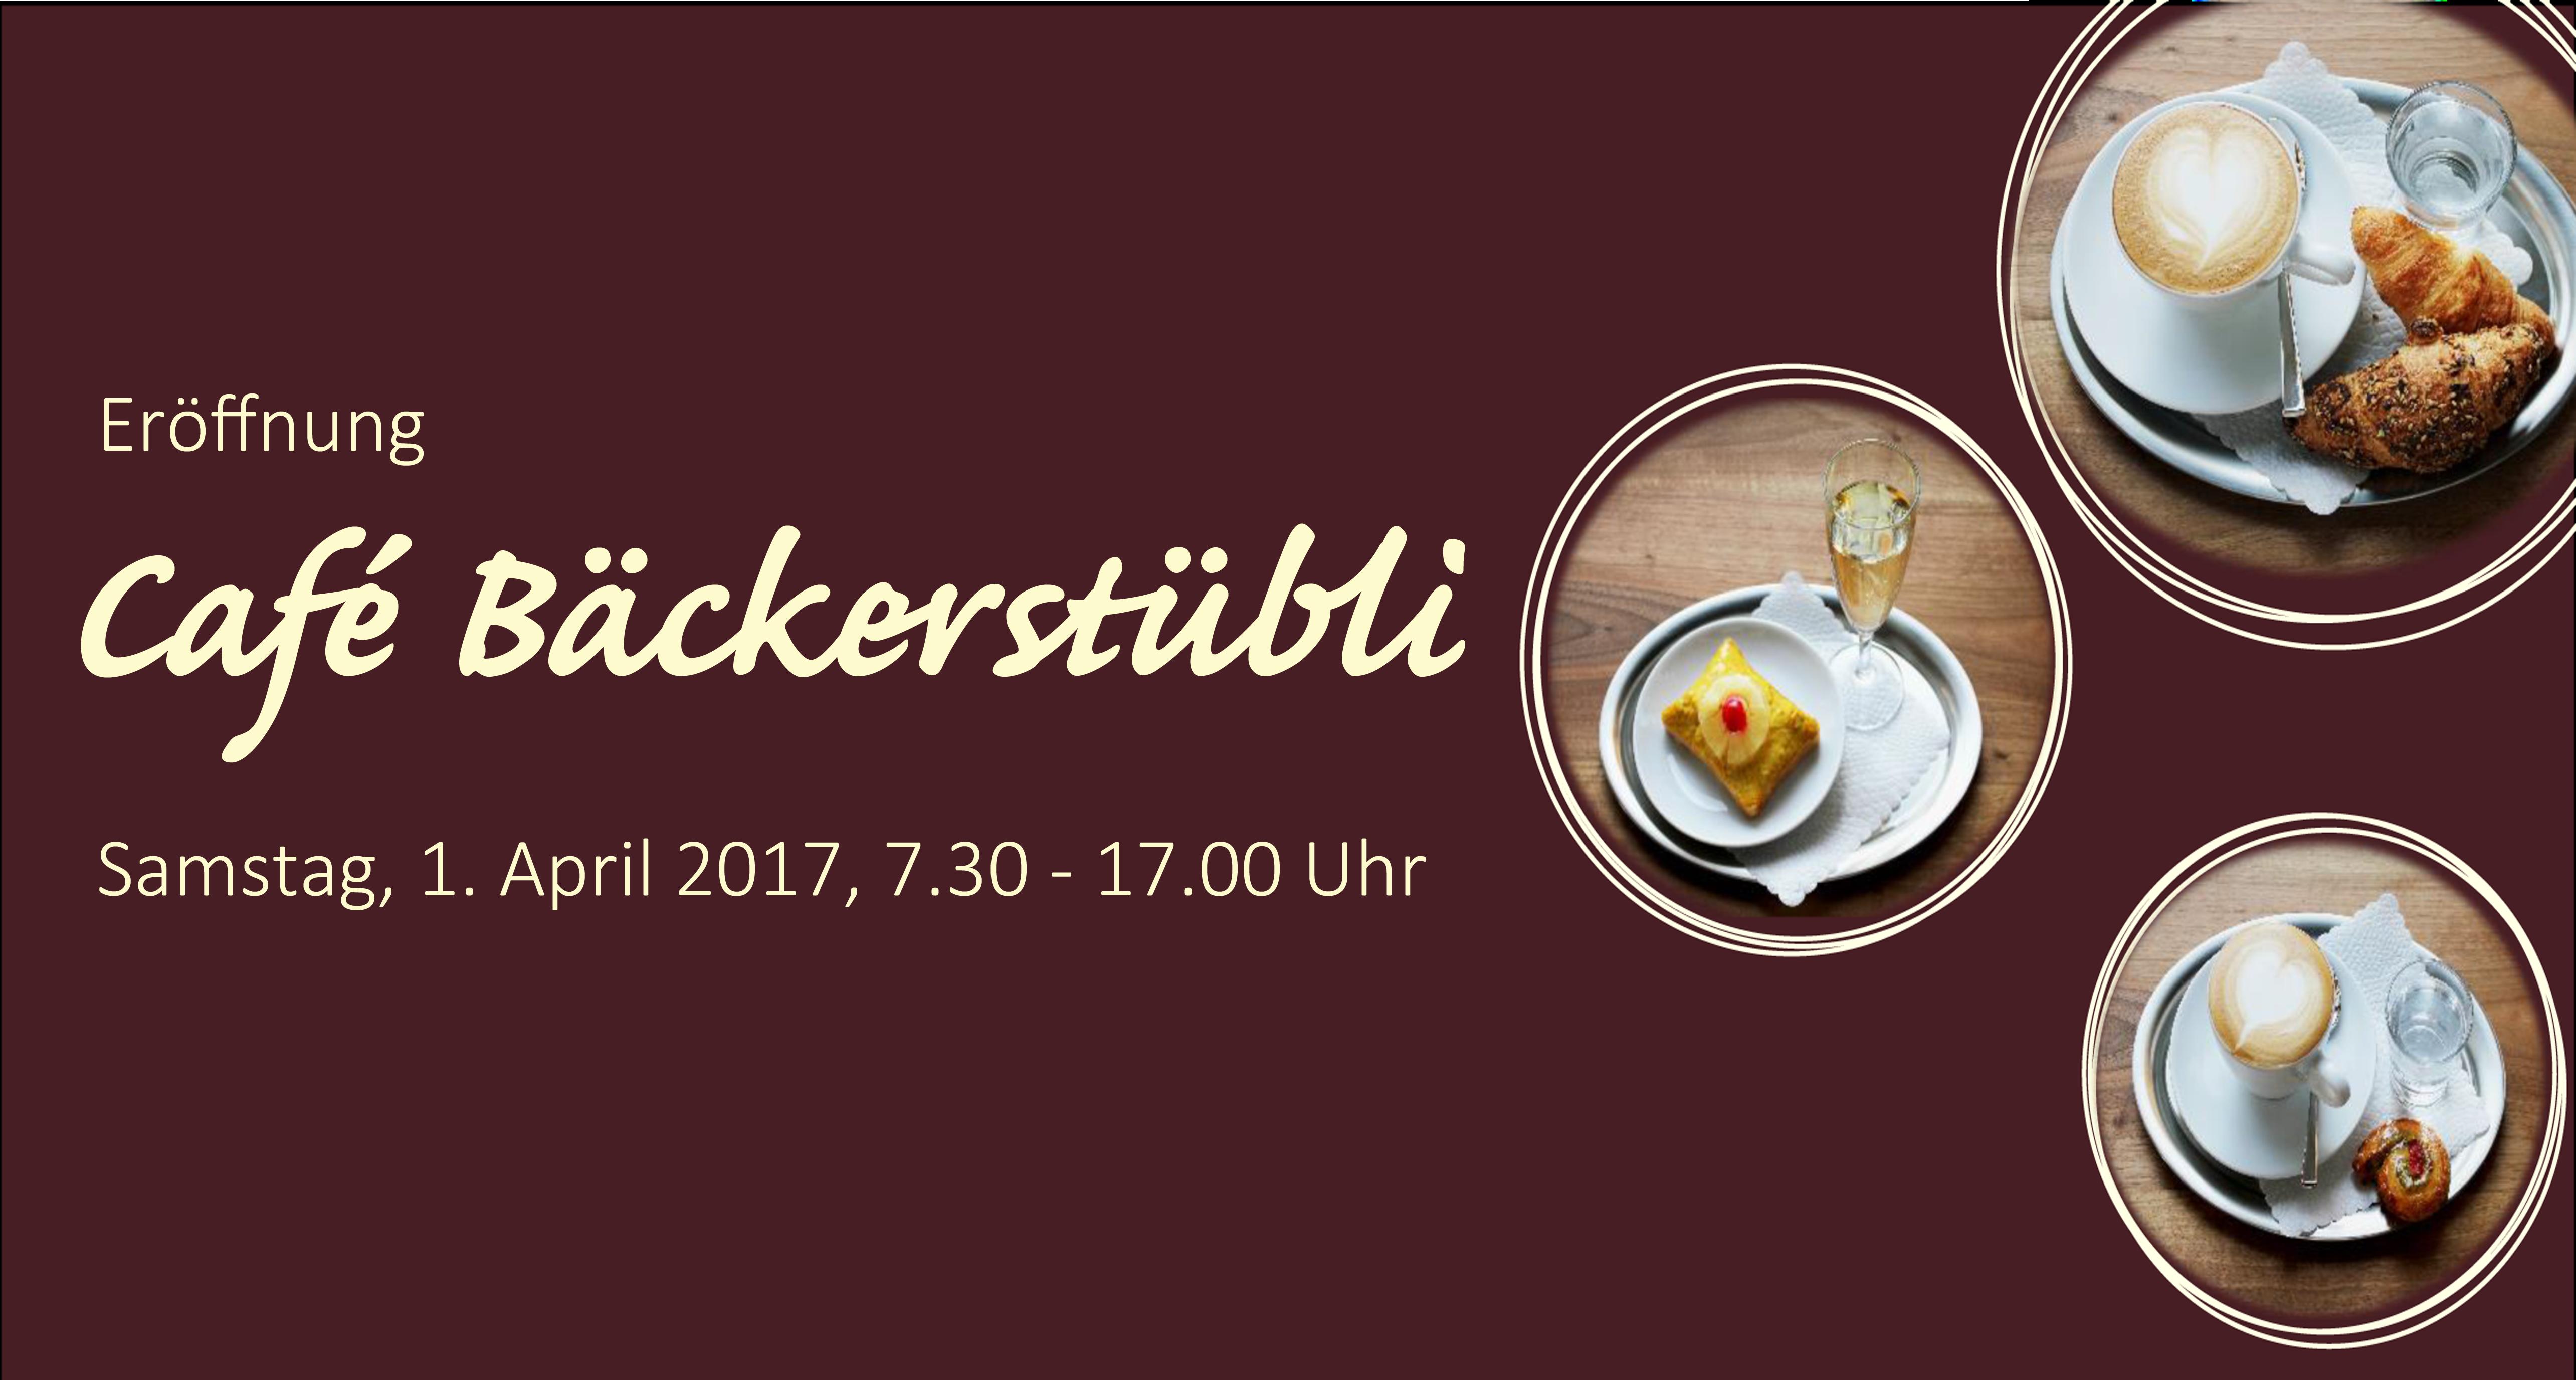 Buergin_Baeckerei_Kreuzlingen_Eroeffnung_Bäckerstuebli_Cafe